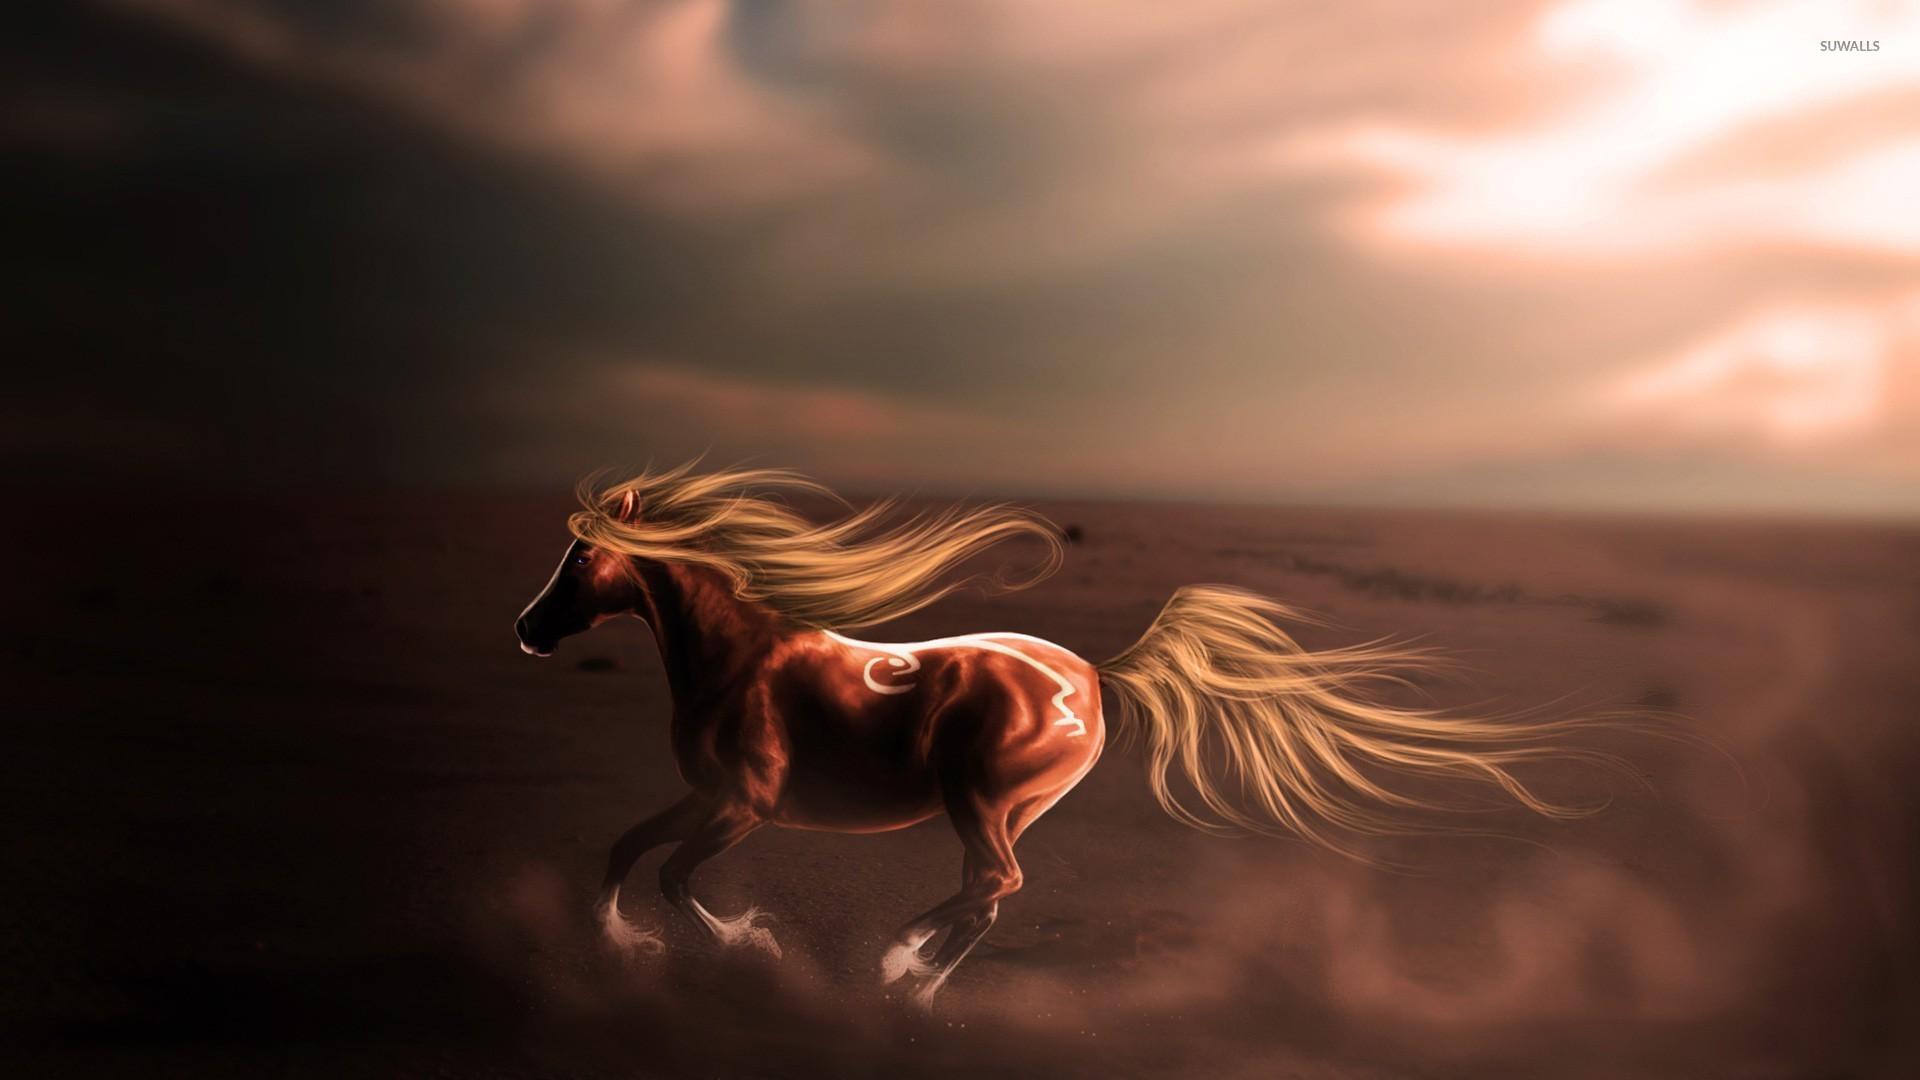 Majestic horse in the desert wallpaper fantasy wallpapers 25789 majestic horse in the desert wallpaper voltagebd Images